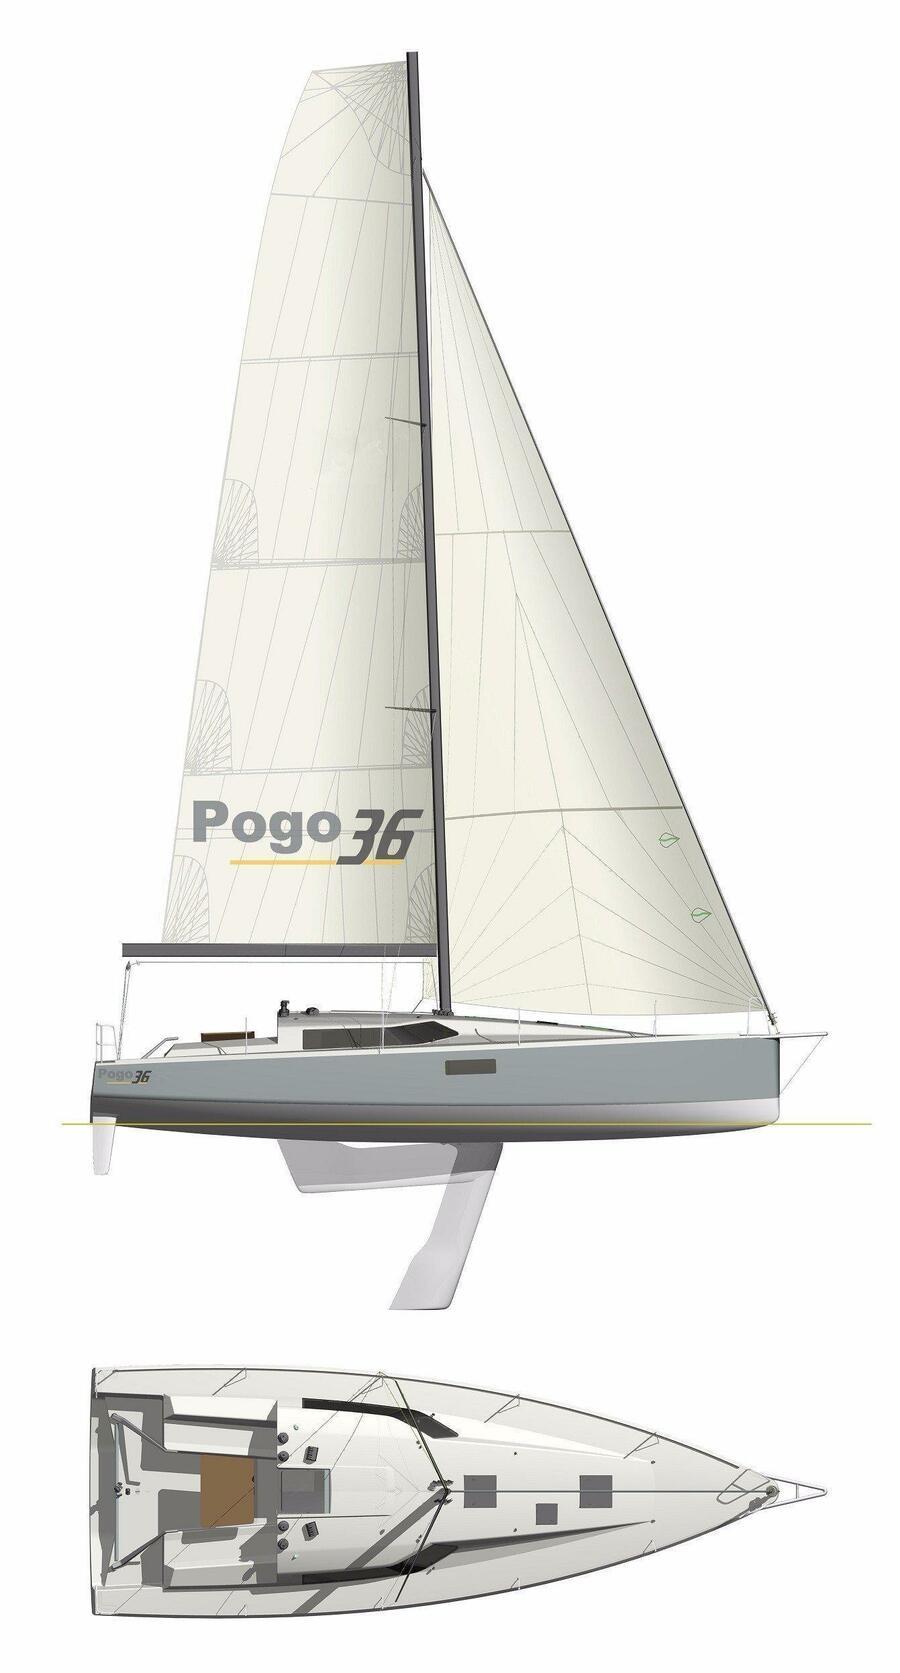 Pogo 36 (POLLUX)  - 13